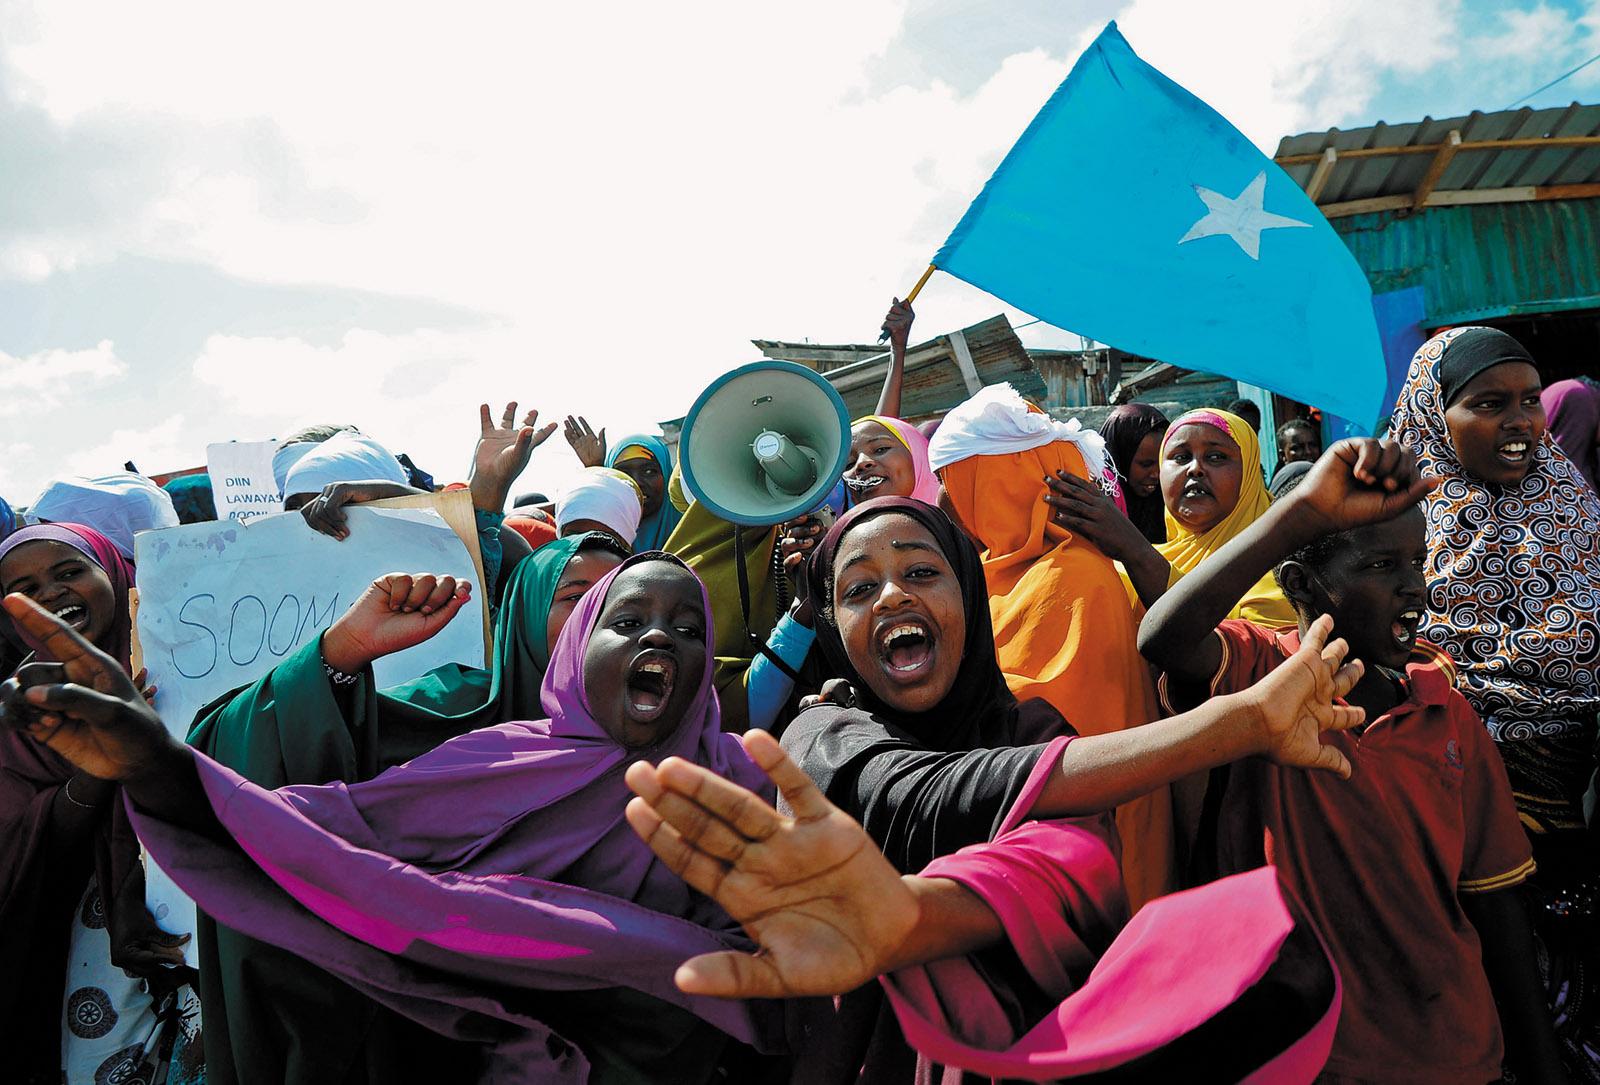 Demonstrators at a protest against the Islamist militia al-Shabab, Mogadishu, Somalia, January 2016